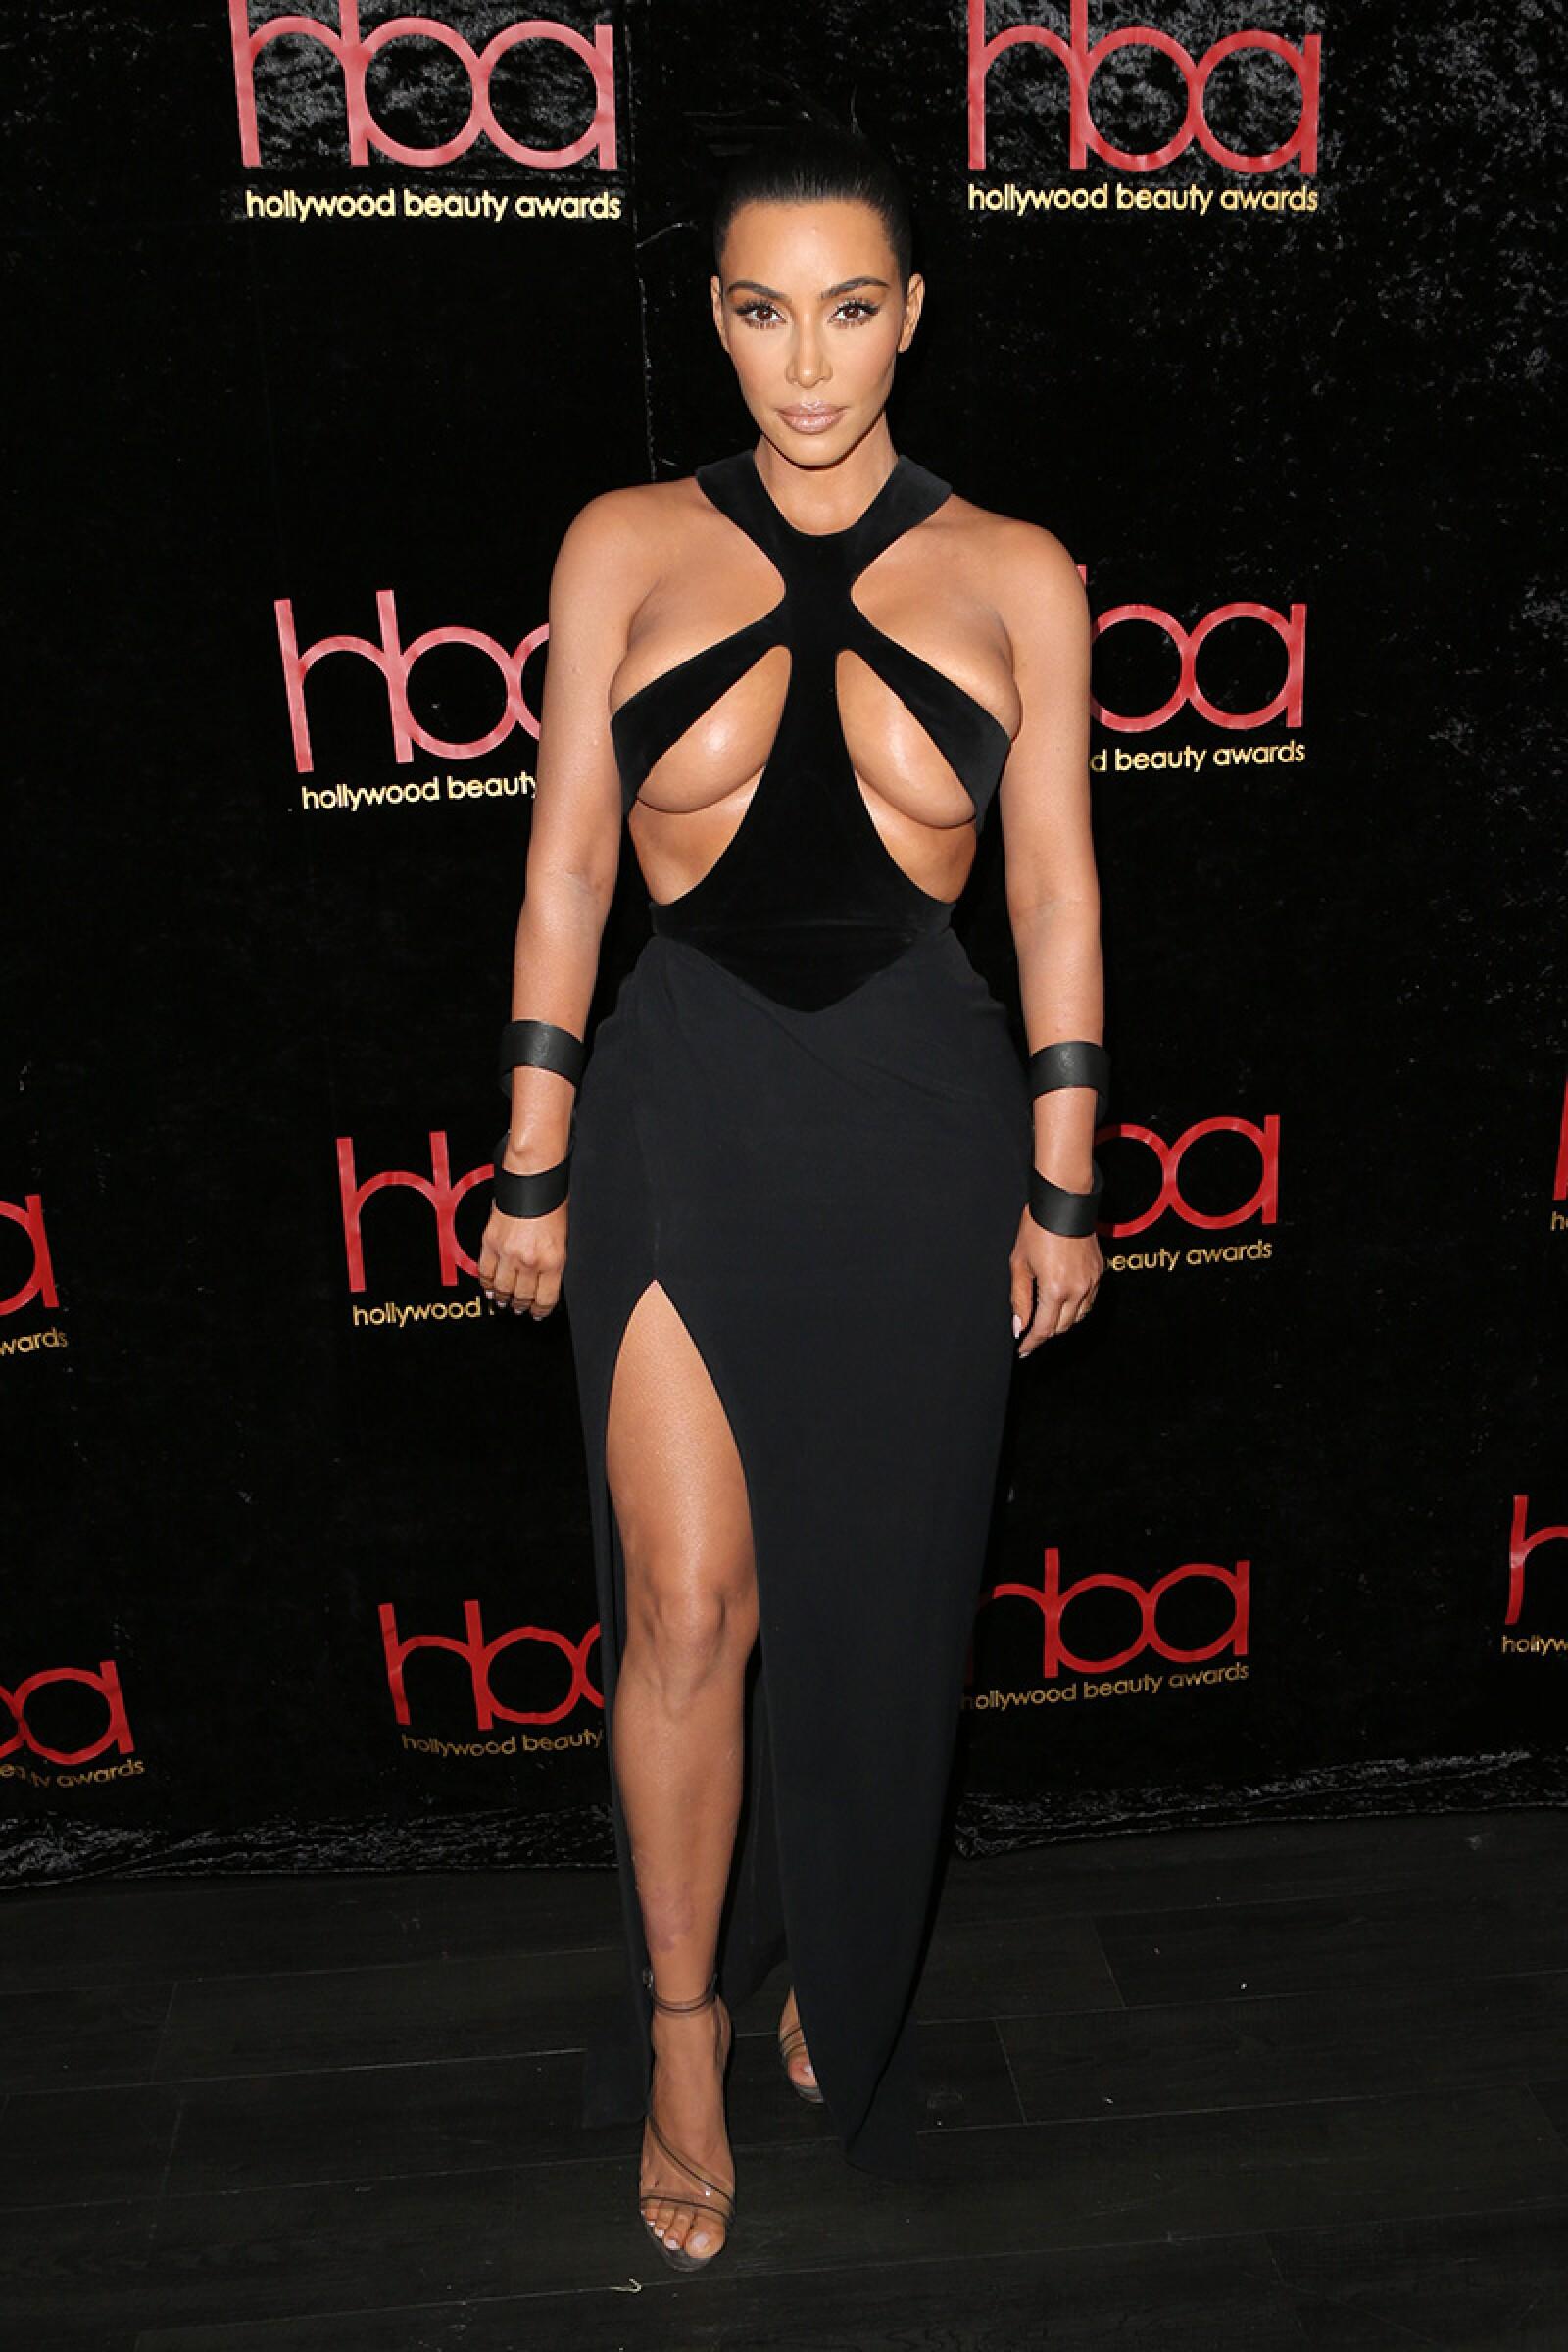 5th Annual Hollywood Beauty Awards, Los Angeles, USA - 17 Feb 2019